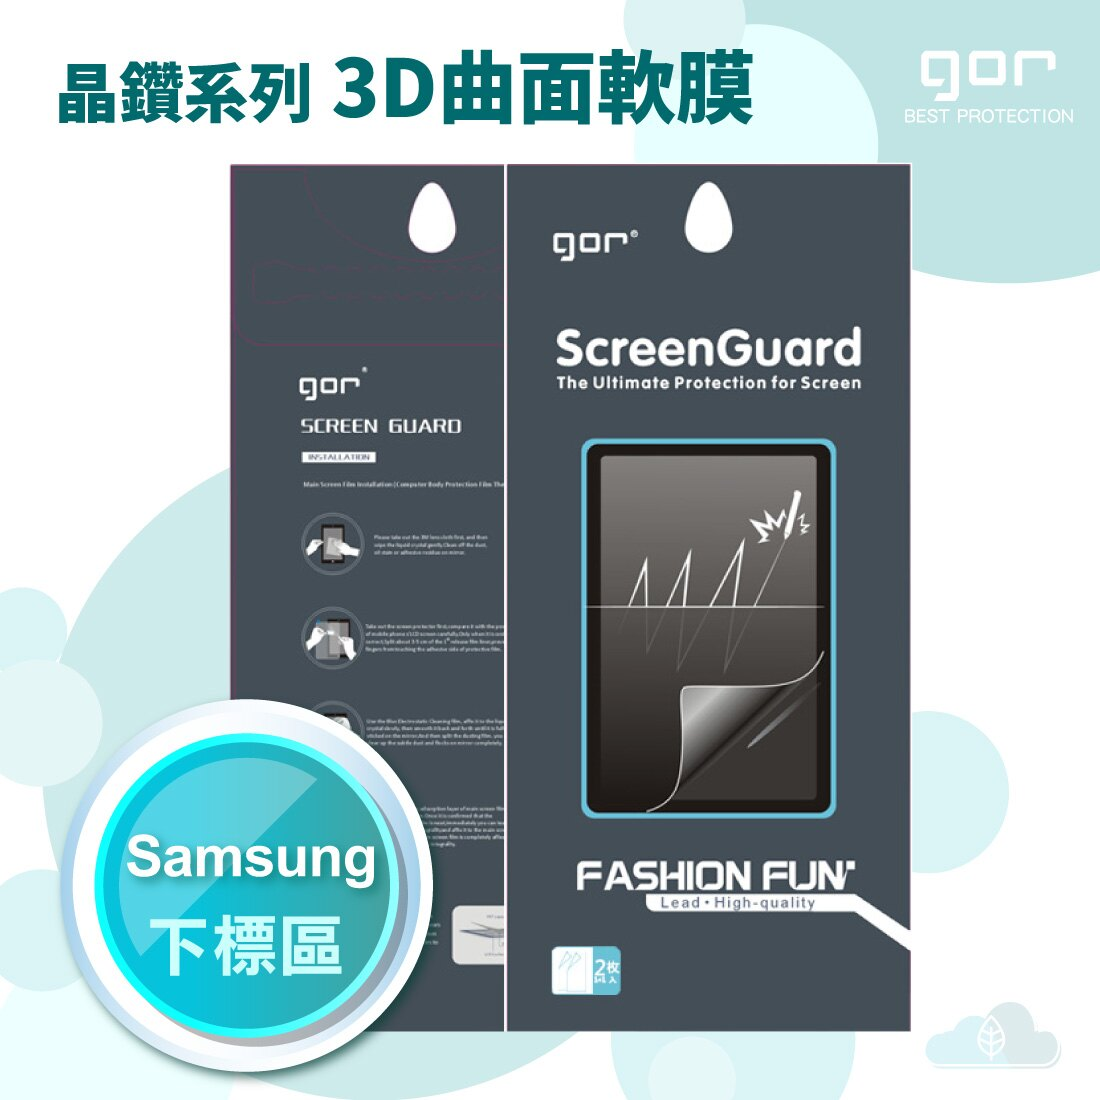 GOR 三星 晶鑽系列 Samsung 下標區 S6 S7 S8 S9 Edge Plus 3D曲面全覆蓋 滿版 PET 軟膜 保護貼